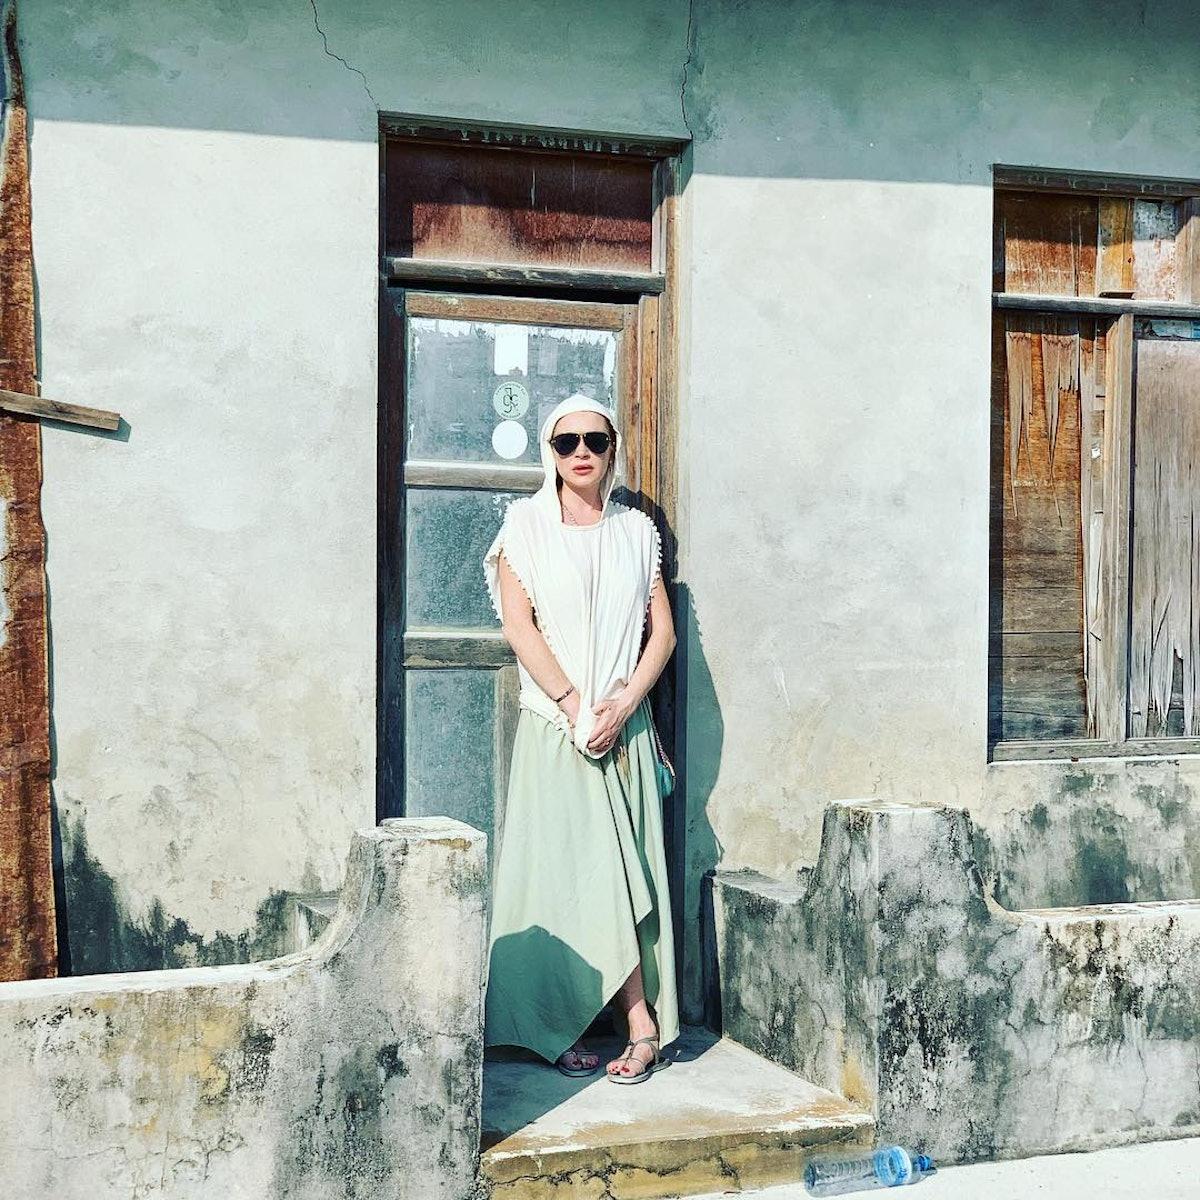 lindsay-lohan-sunglasses-insta.jpg